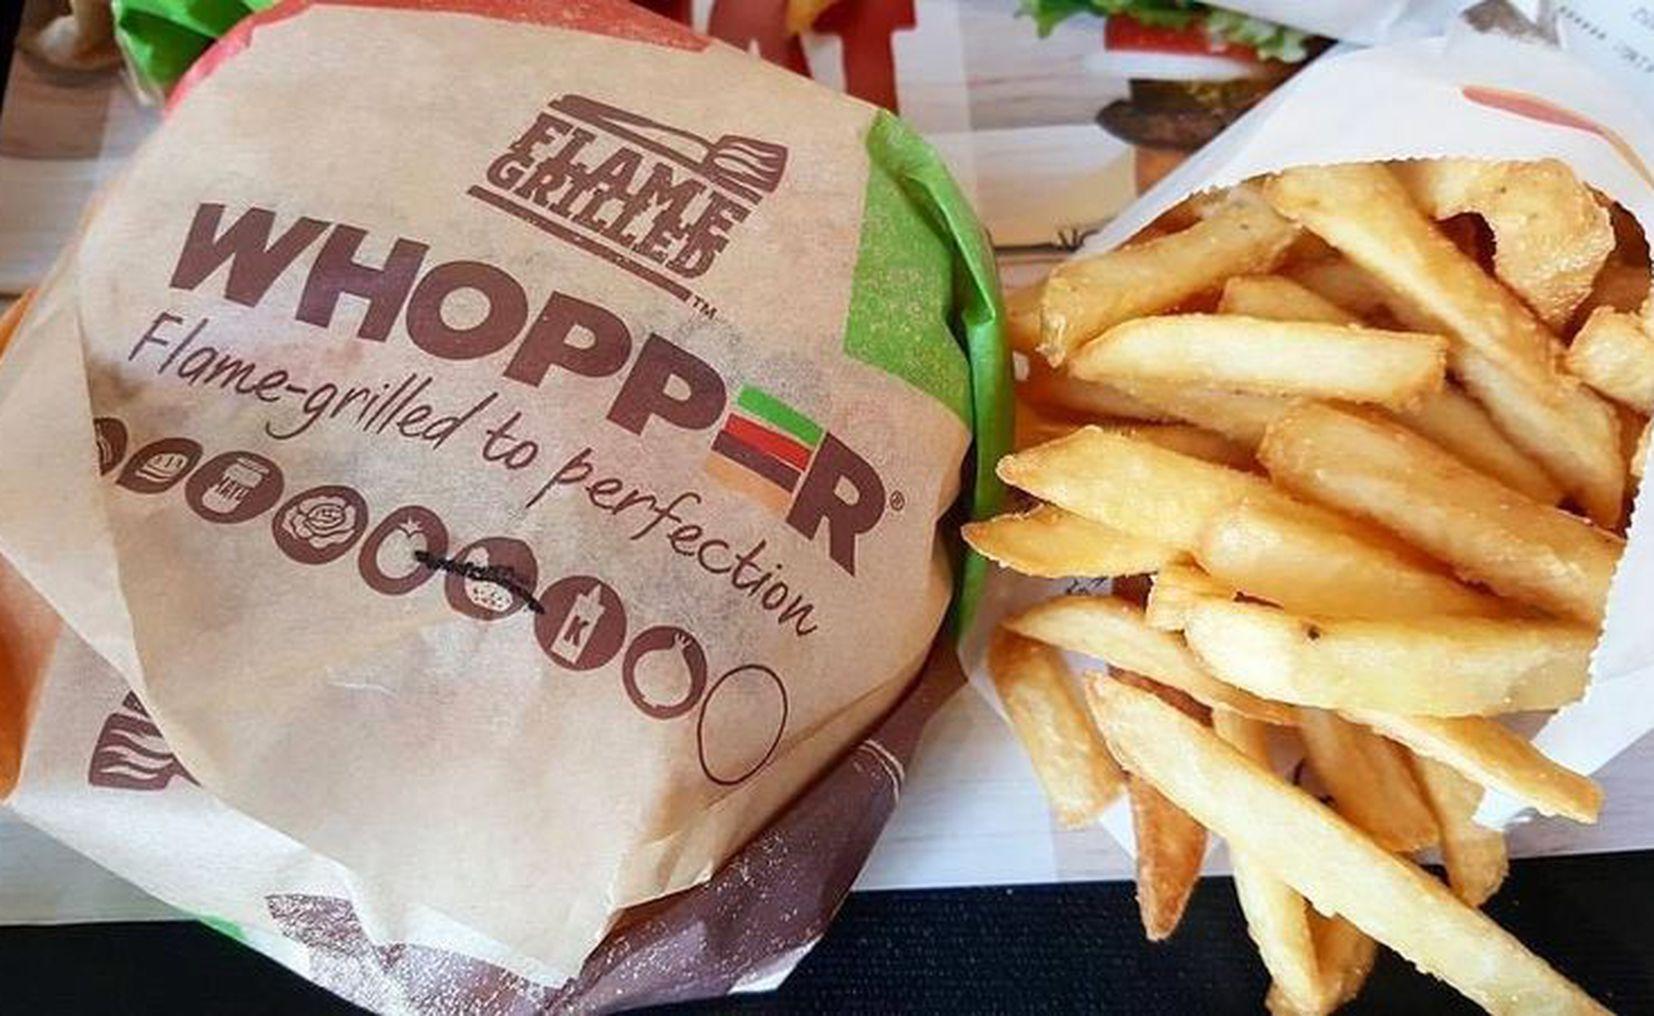 Hoy es Burger Day, Carl's Jr. venderá hamburguesas a 1 peso